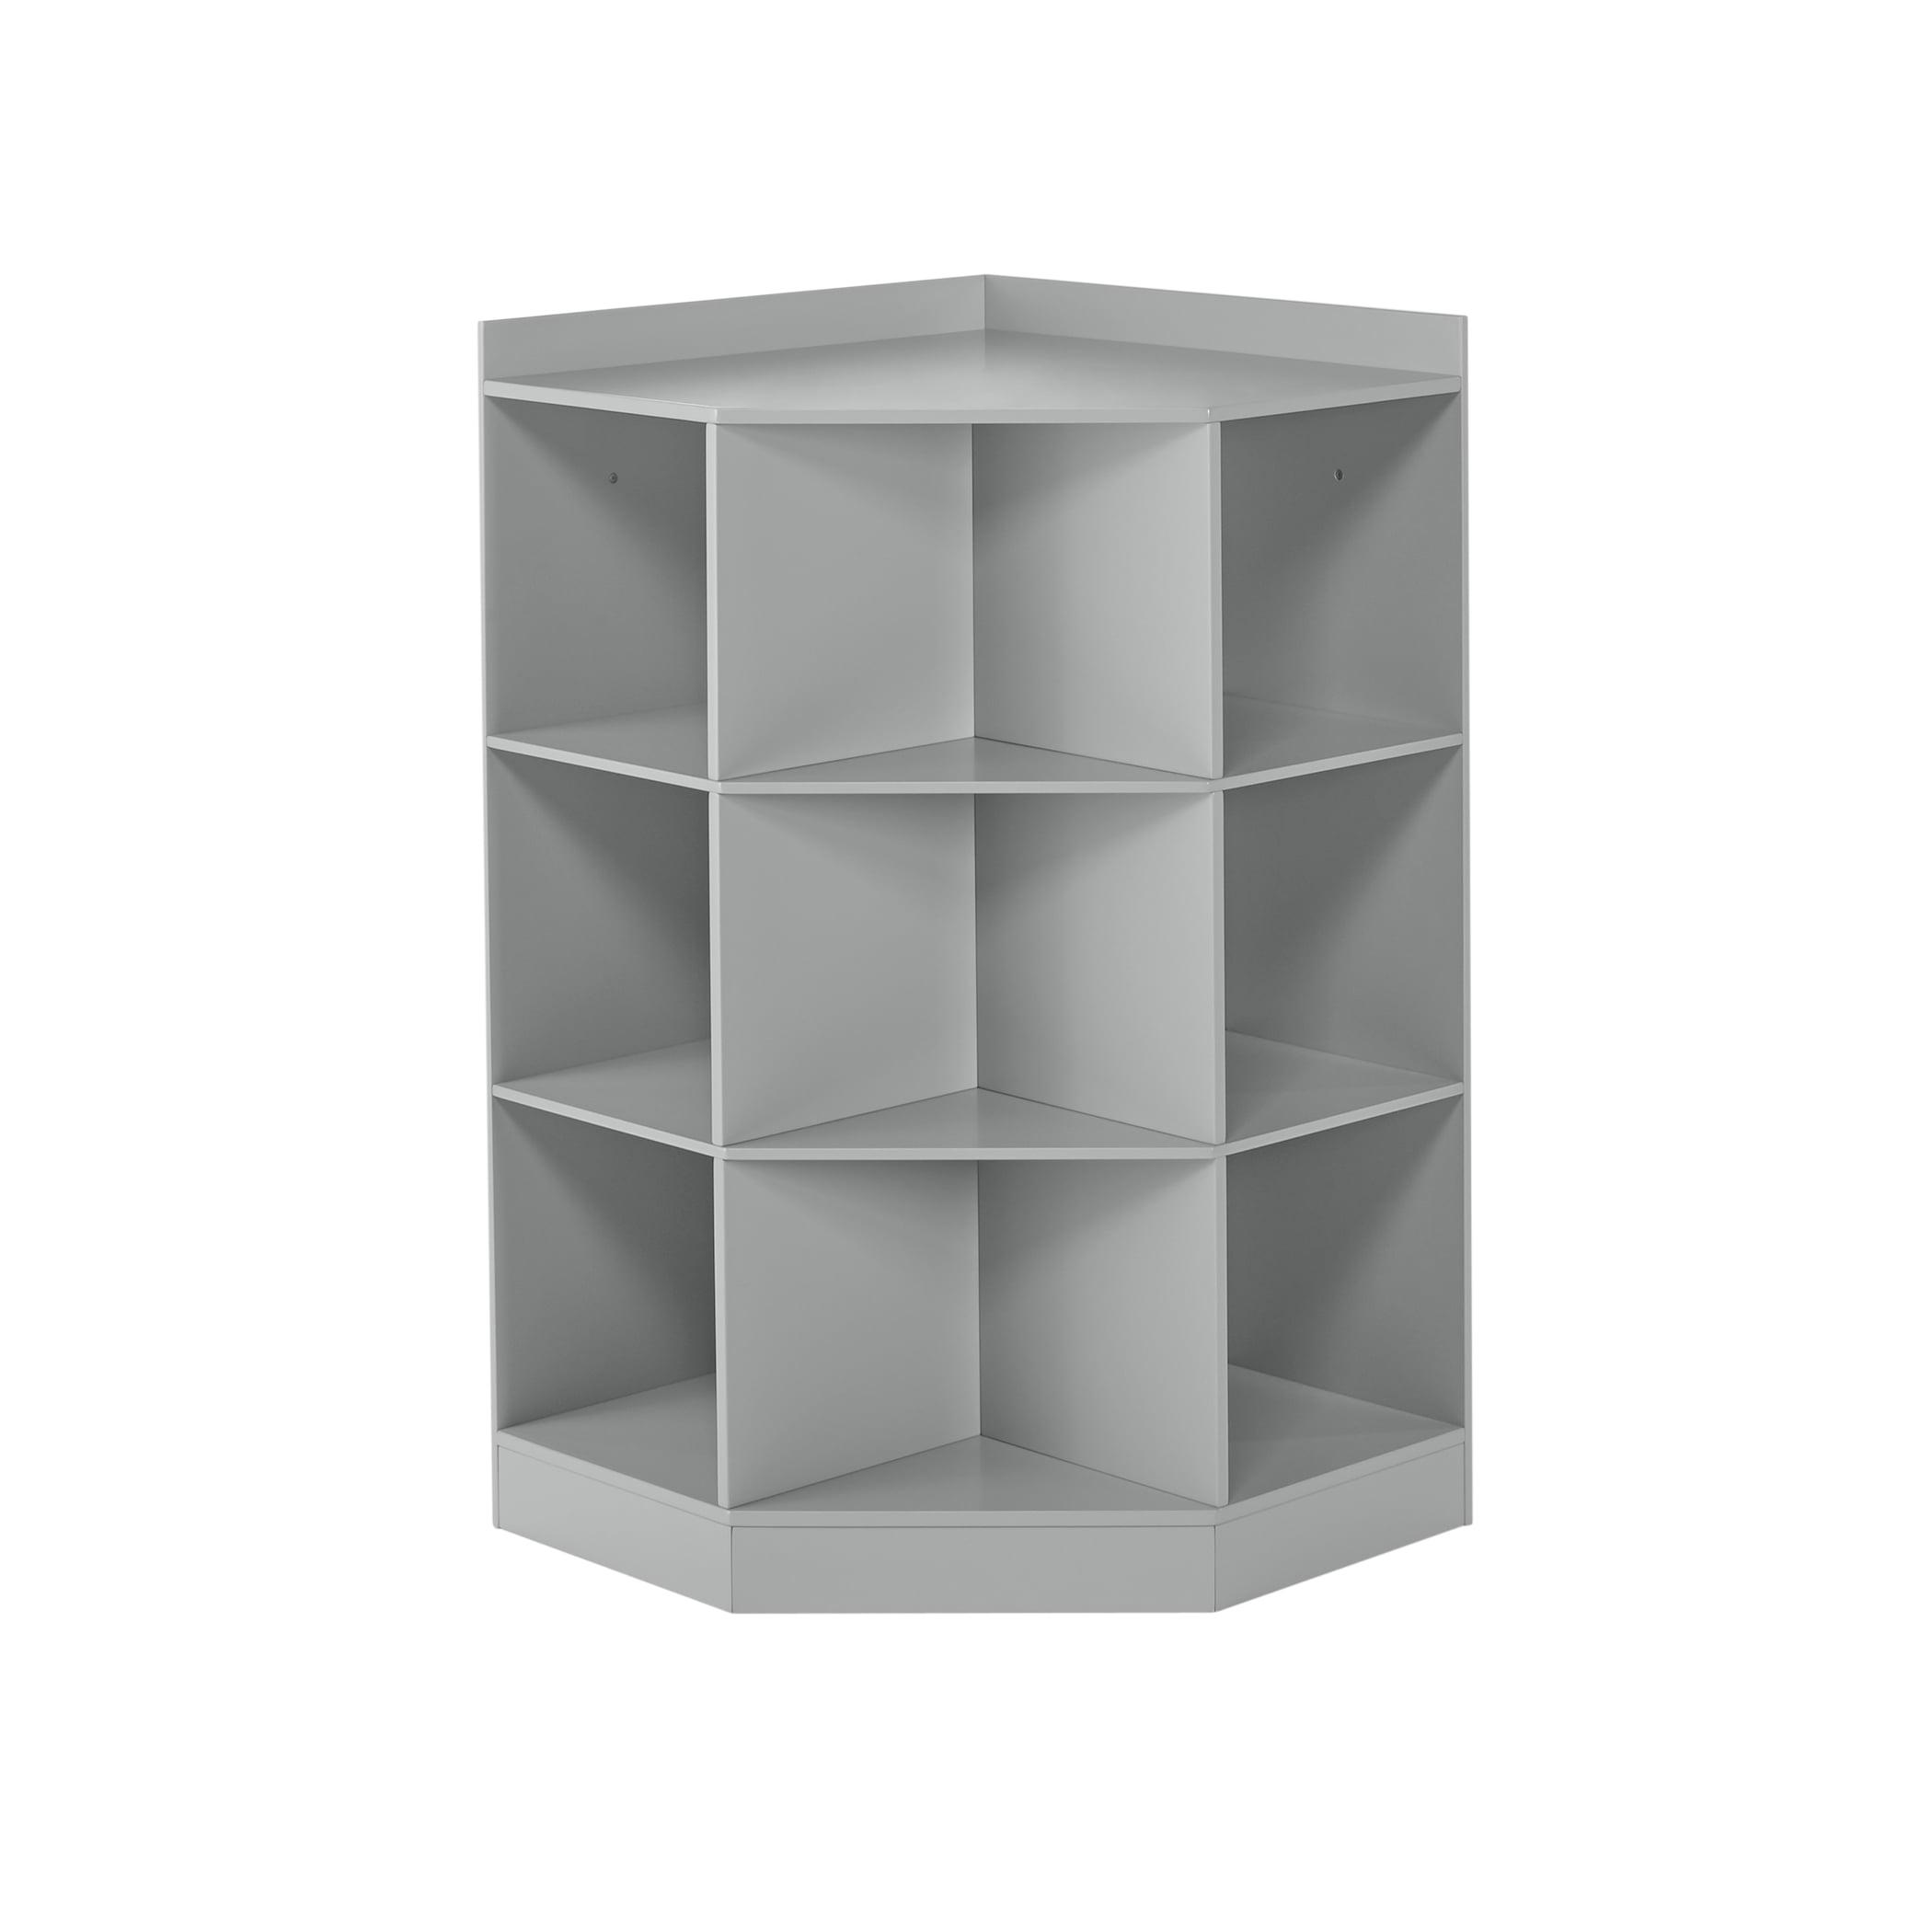 RiverRidge Kids 6-Cubby, 3-Shelf Corner Cabinet by Sourcing Solutions, Inc.